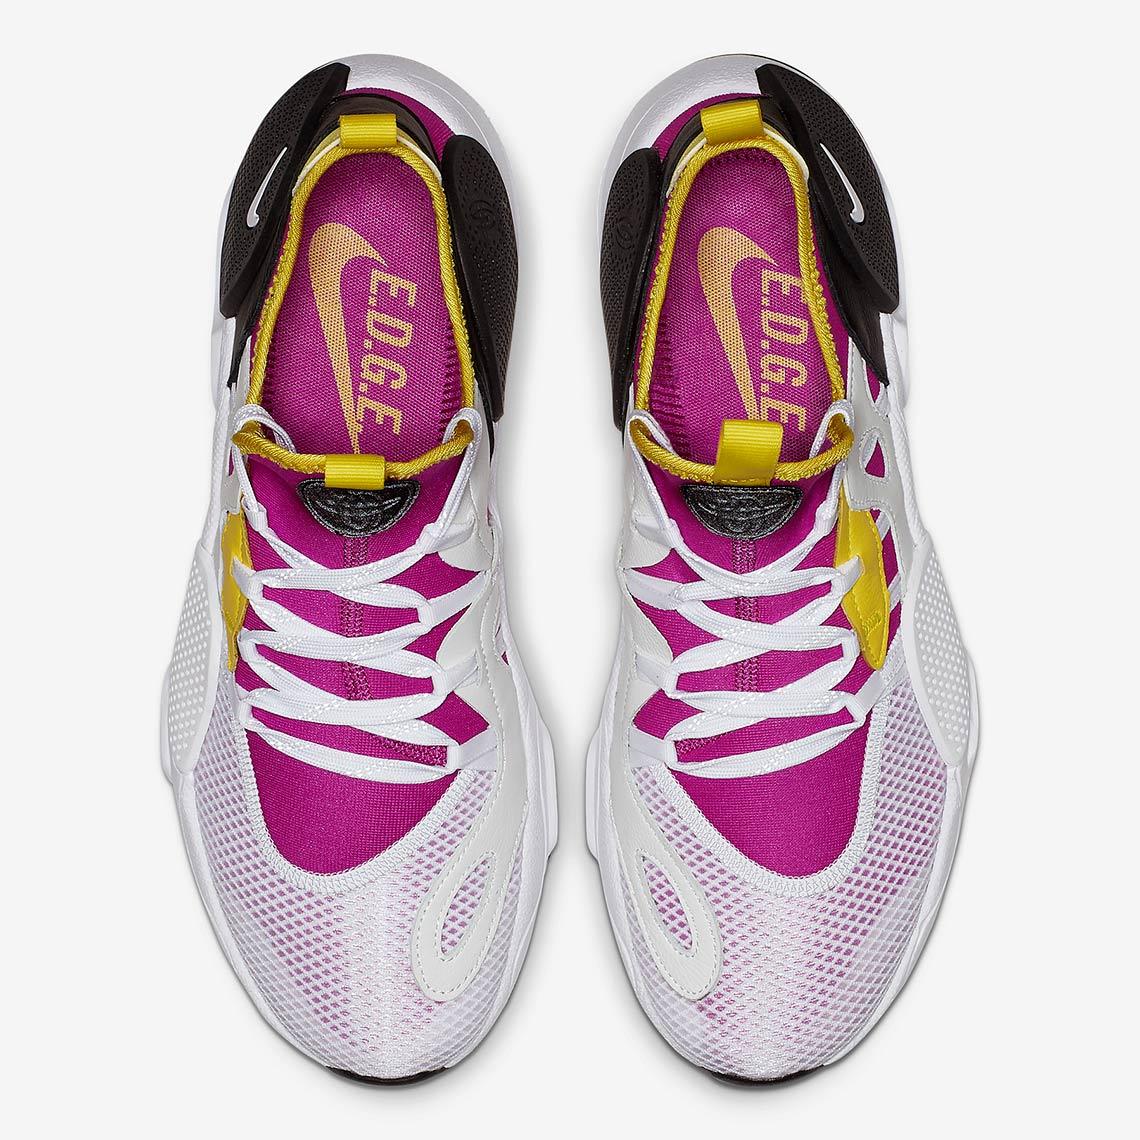 Nike Air Huarache Edge TXT Release Date January 1, 2019 (China) $110.  Color Magenta/Neon Yellow/Black/White